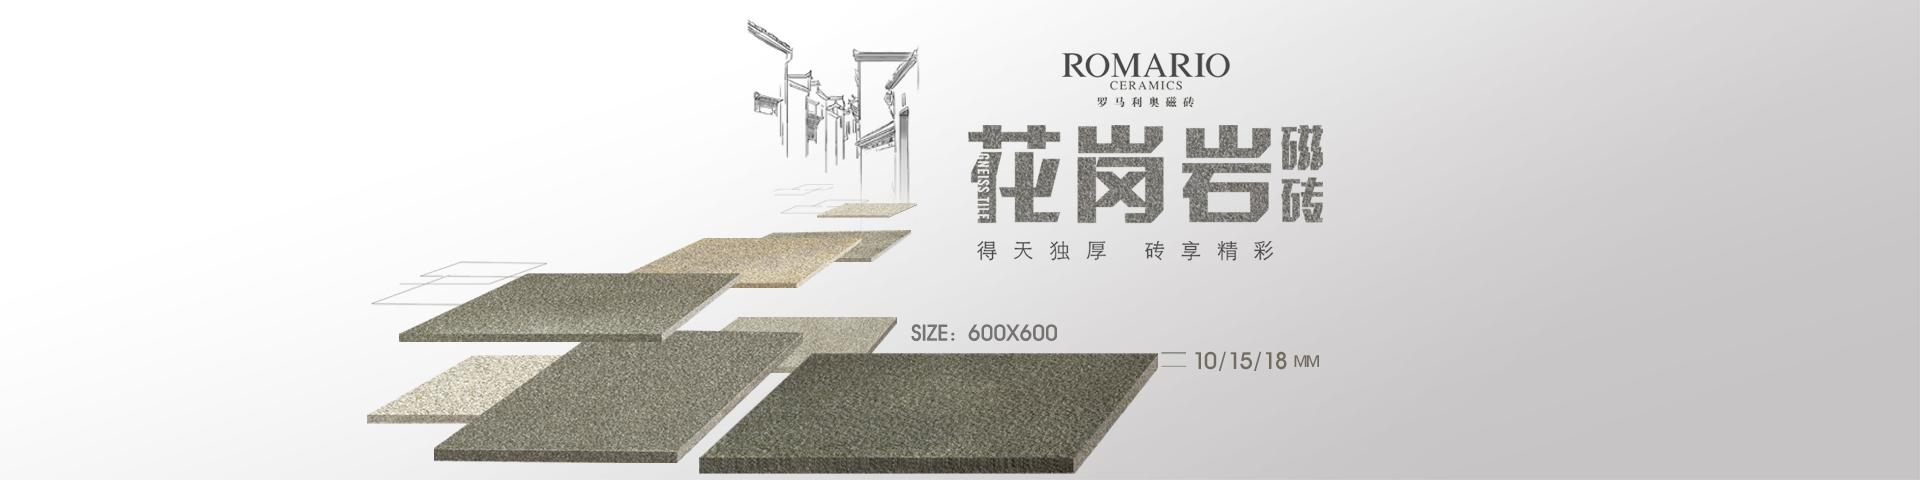 http://www.romario.com.cn/